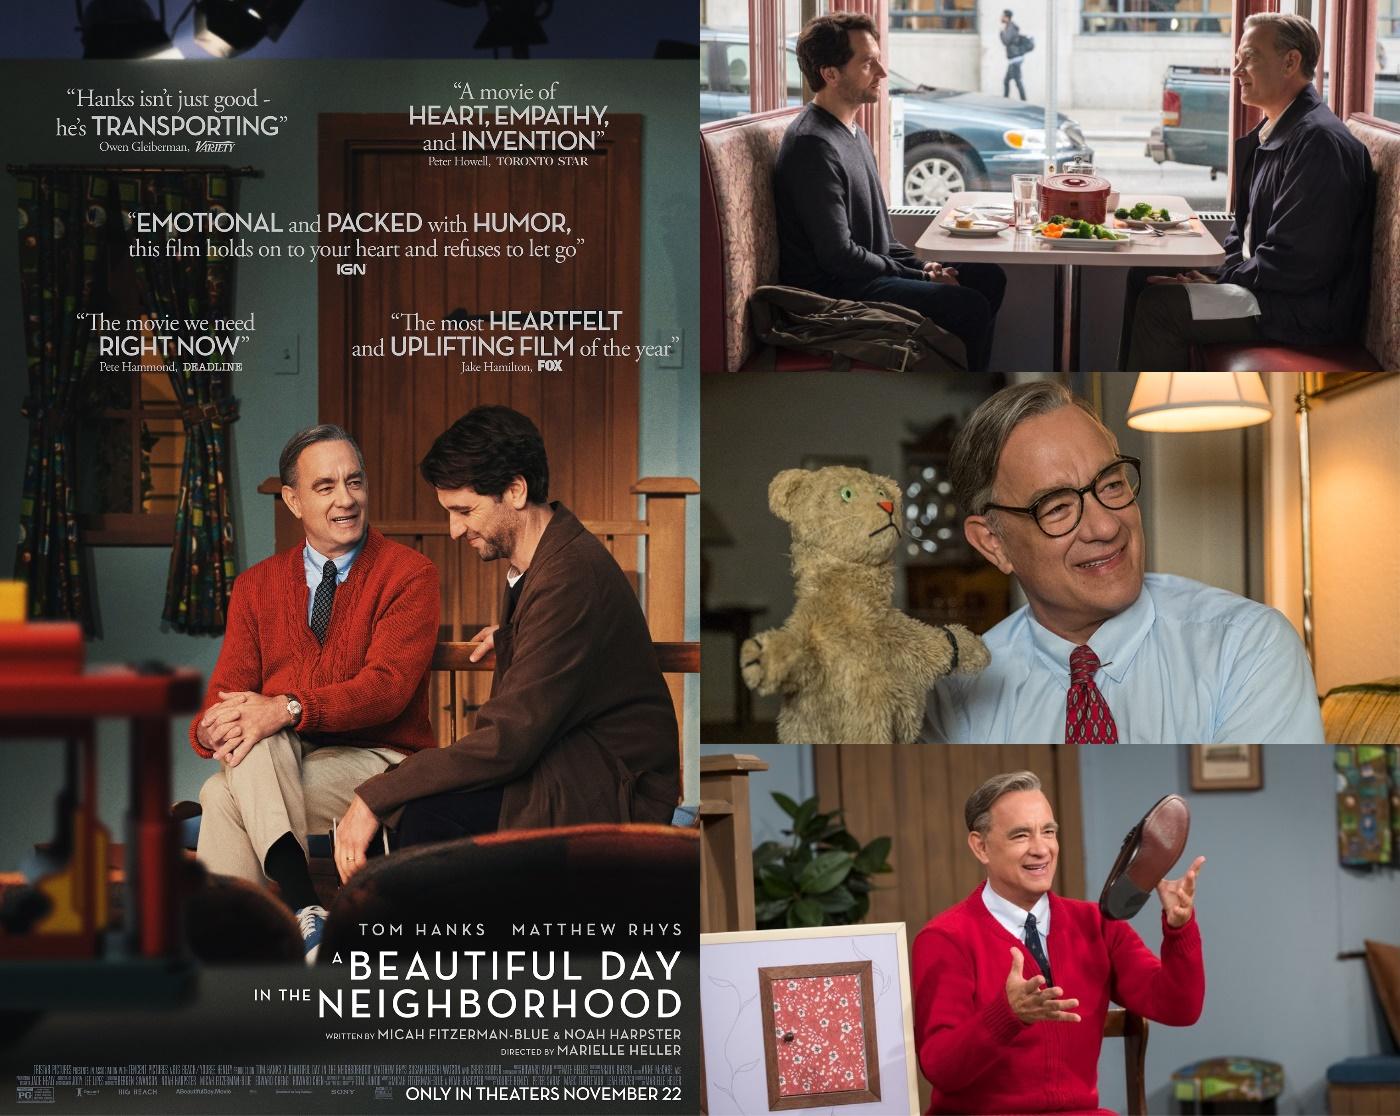 Tom Hanks & Matthew Rhys, In a Beautiful Day in the Neighborhood